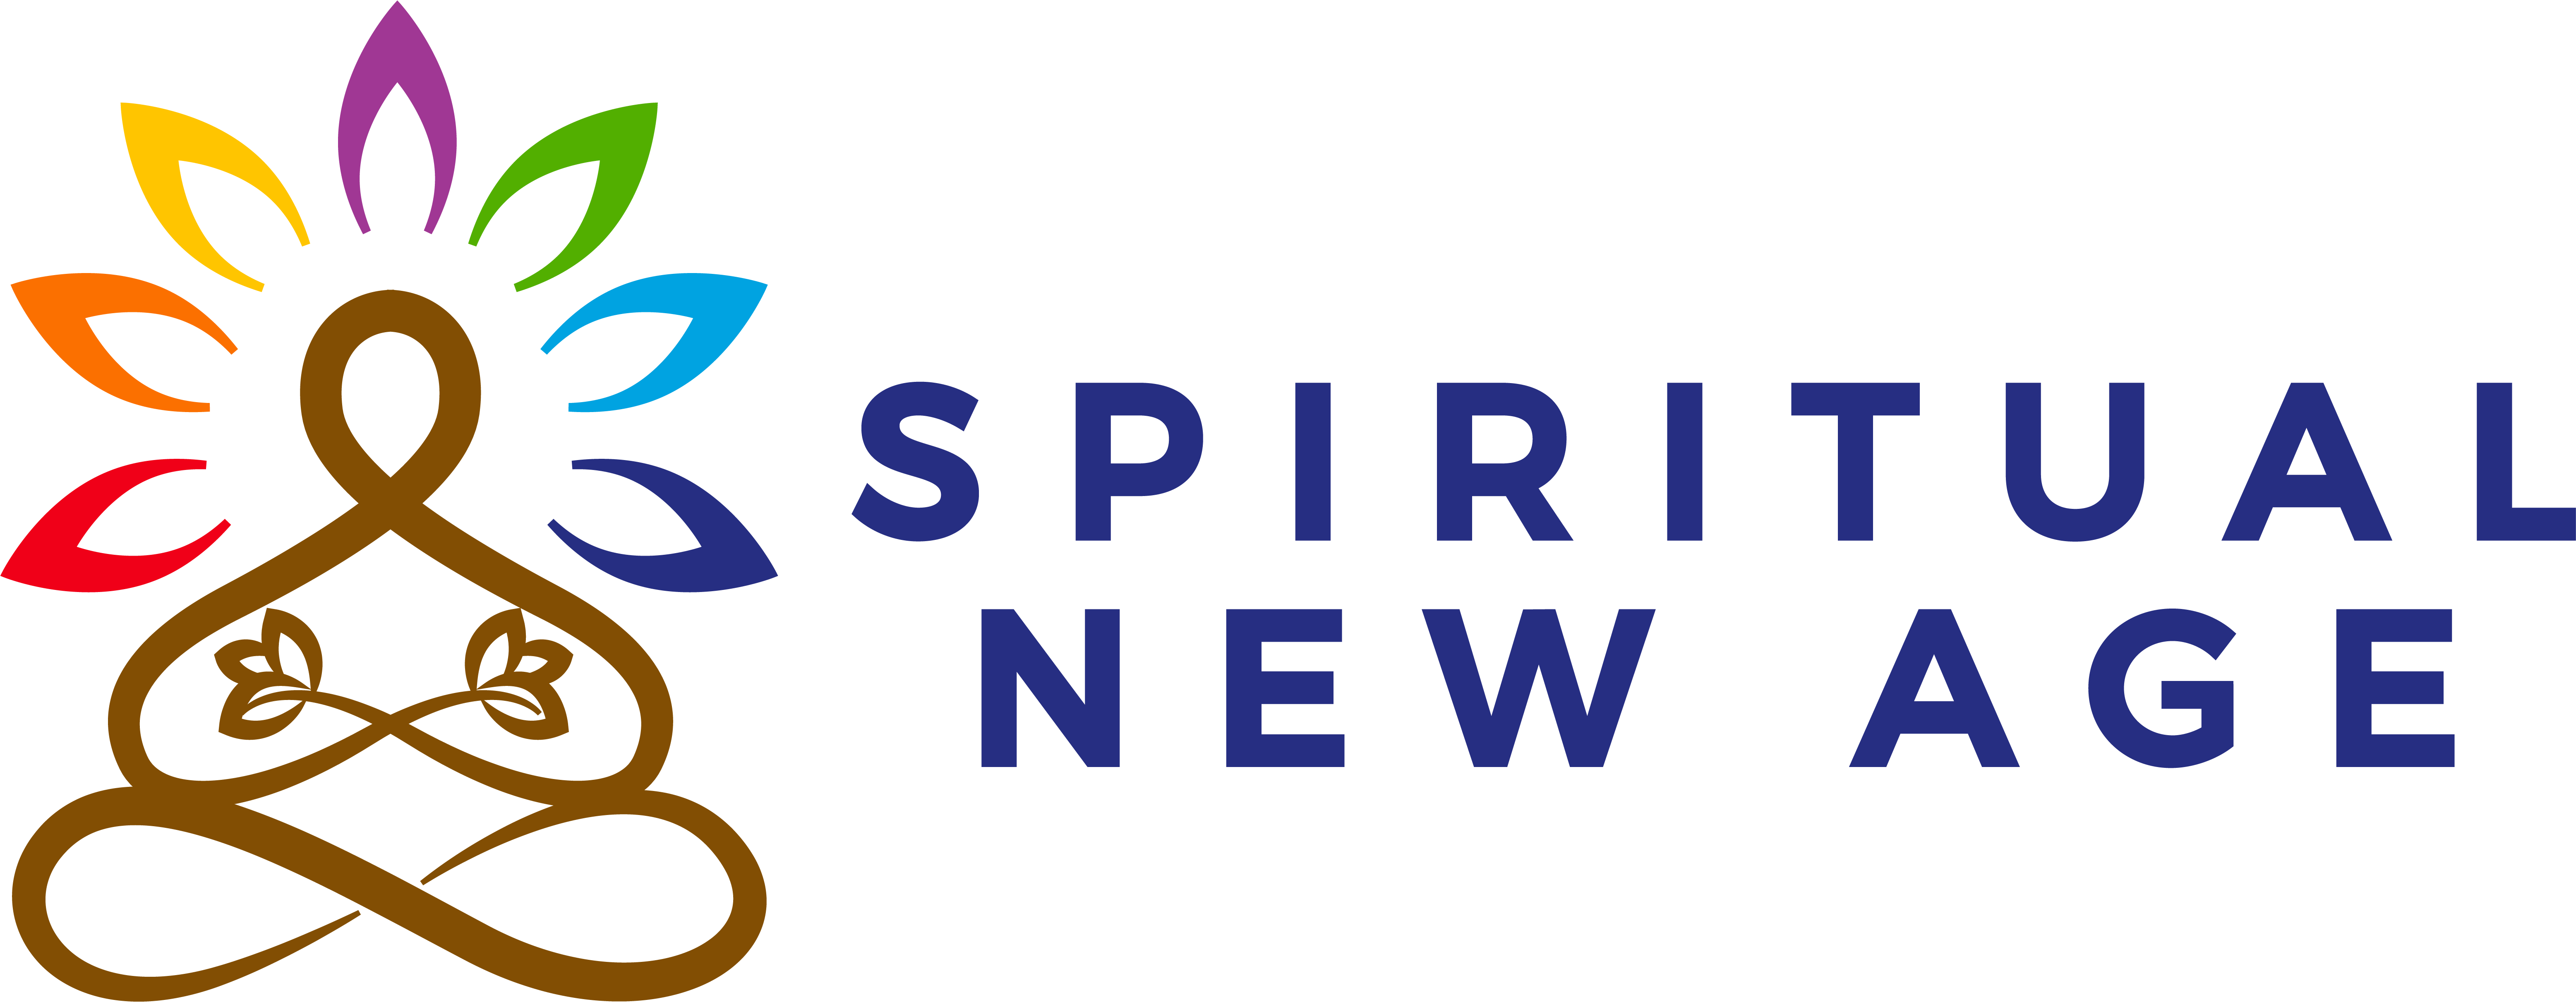 Spiritual New Age